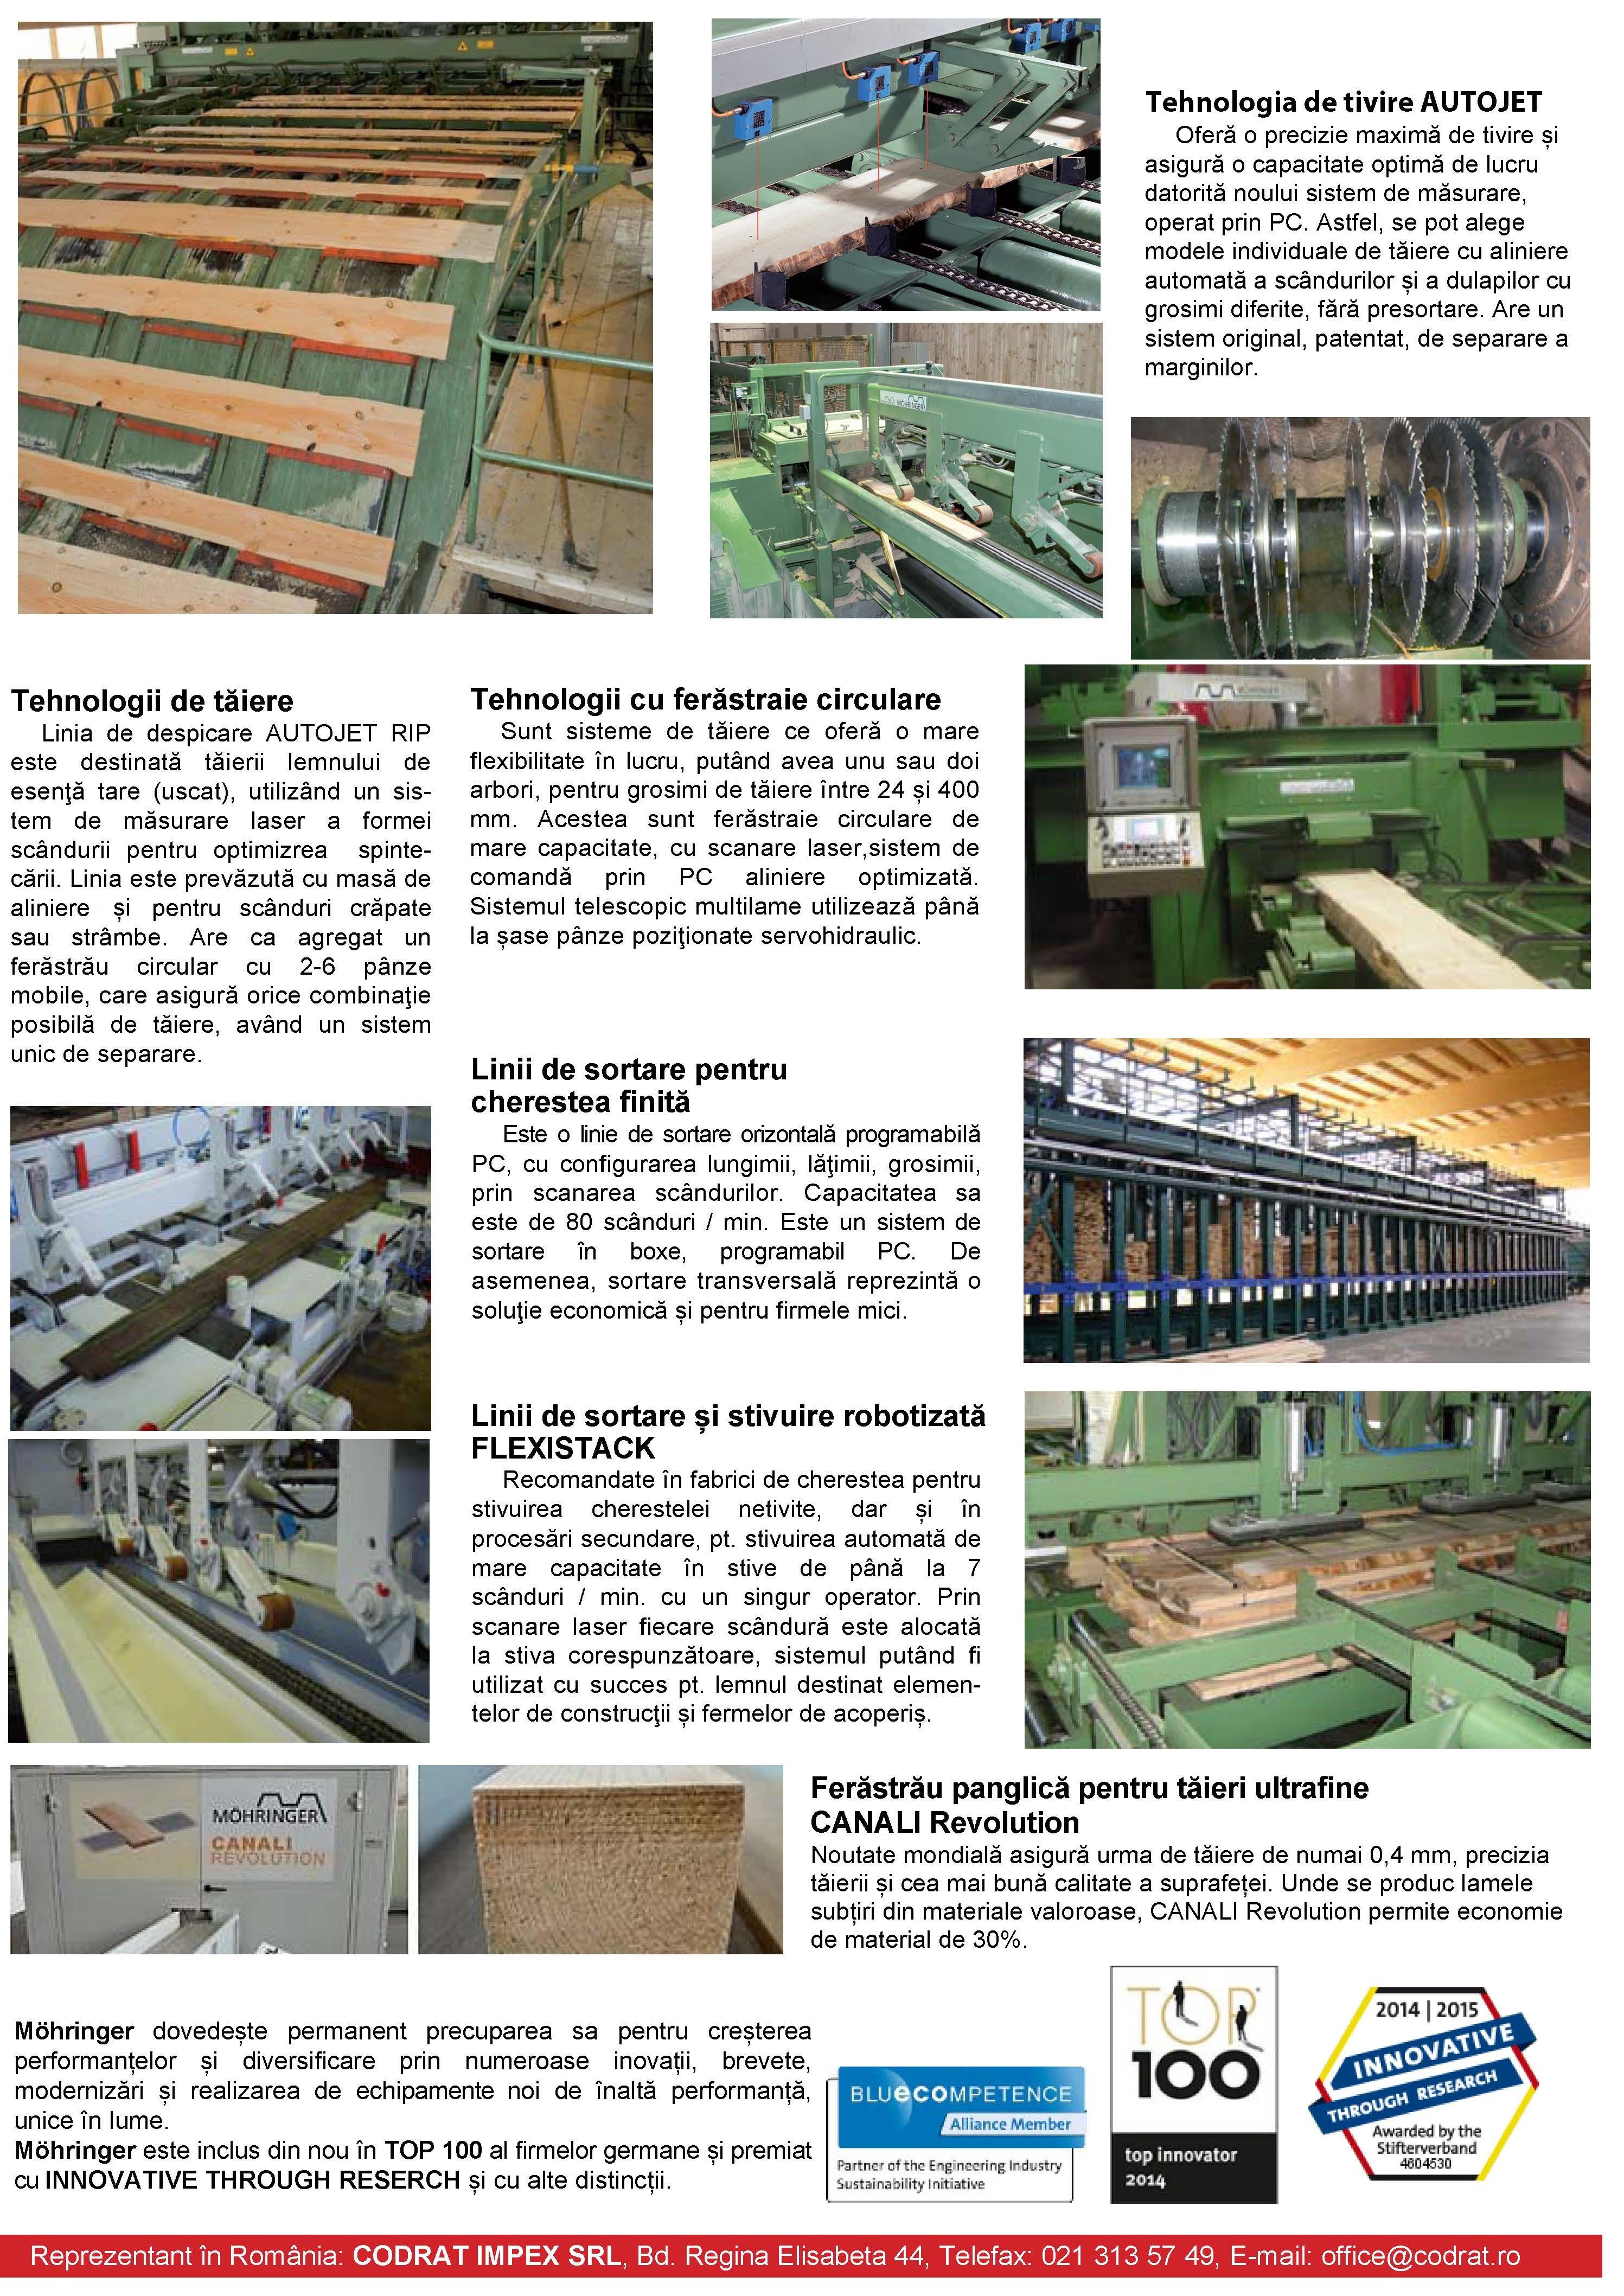 MohringerCODRAT Page_2.2